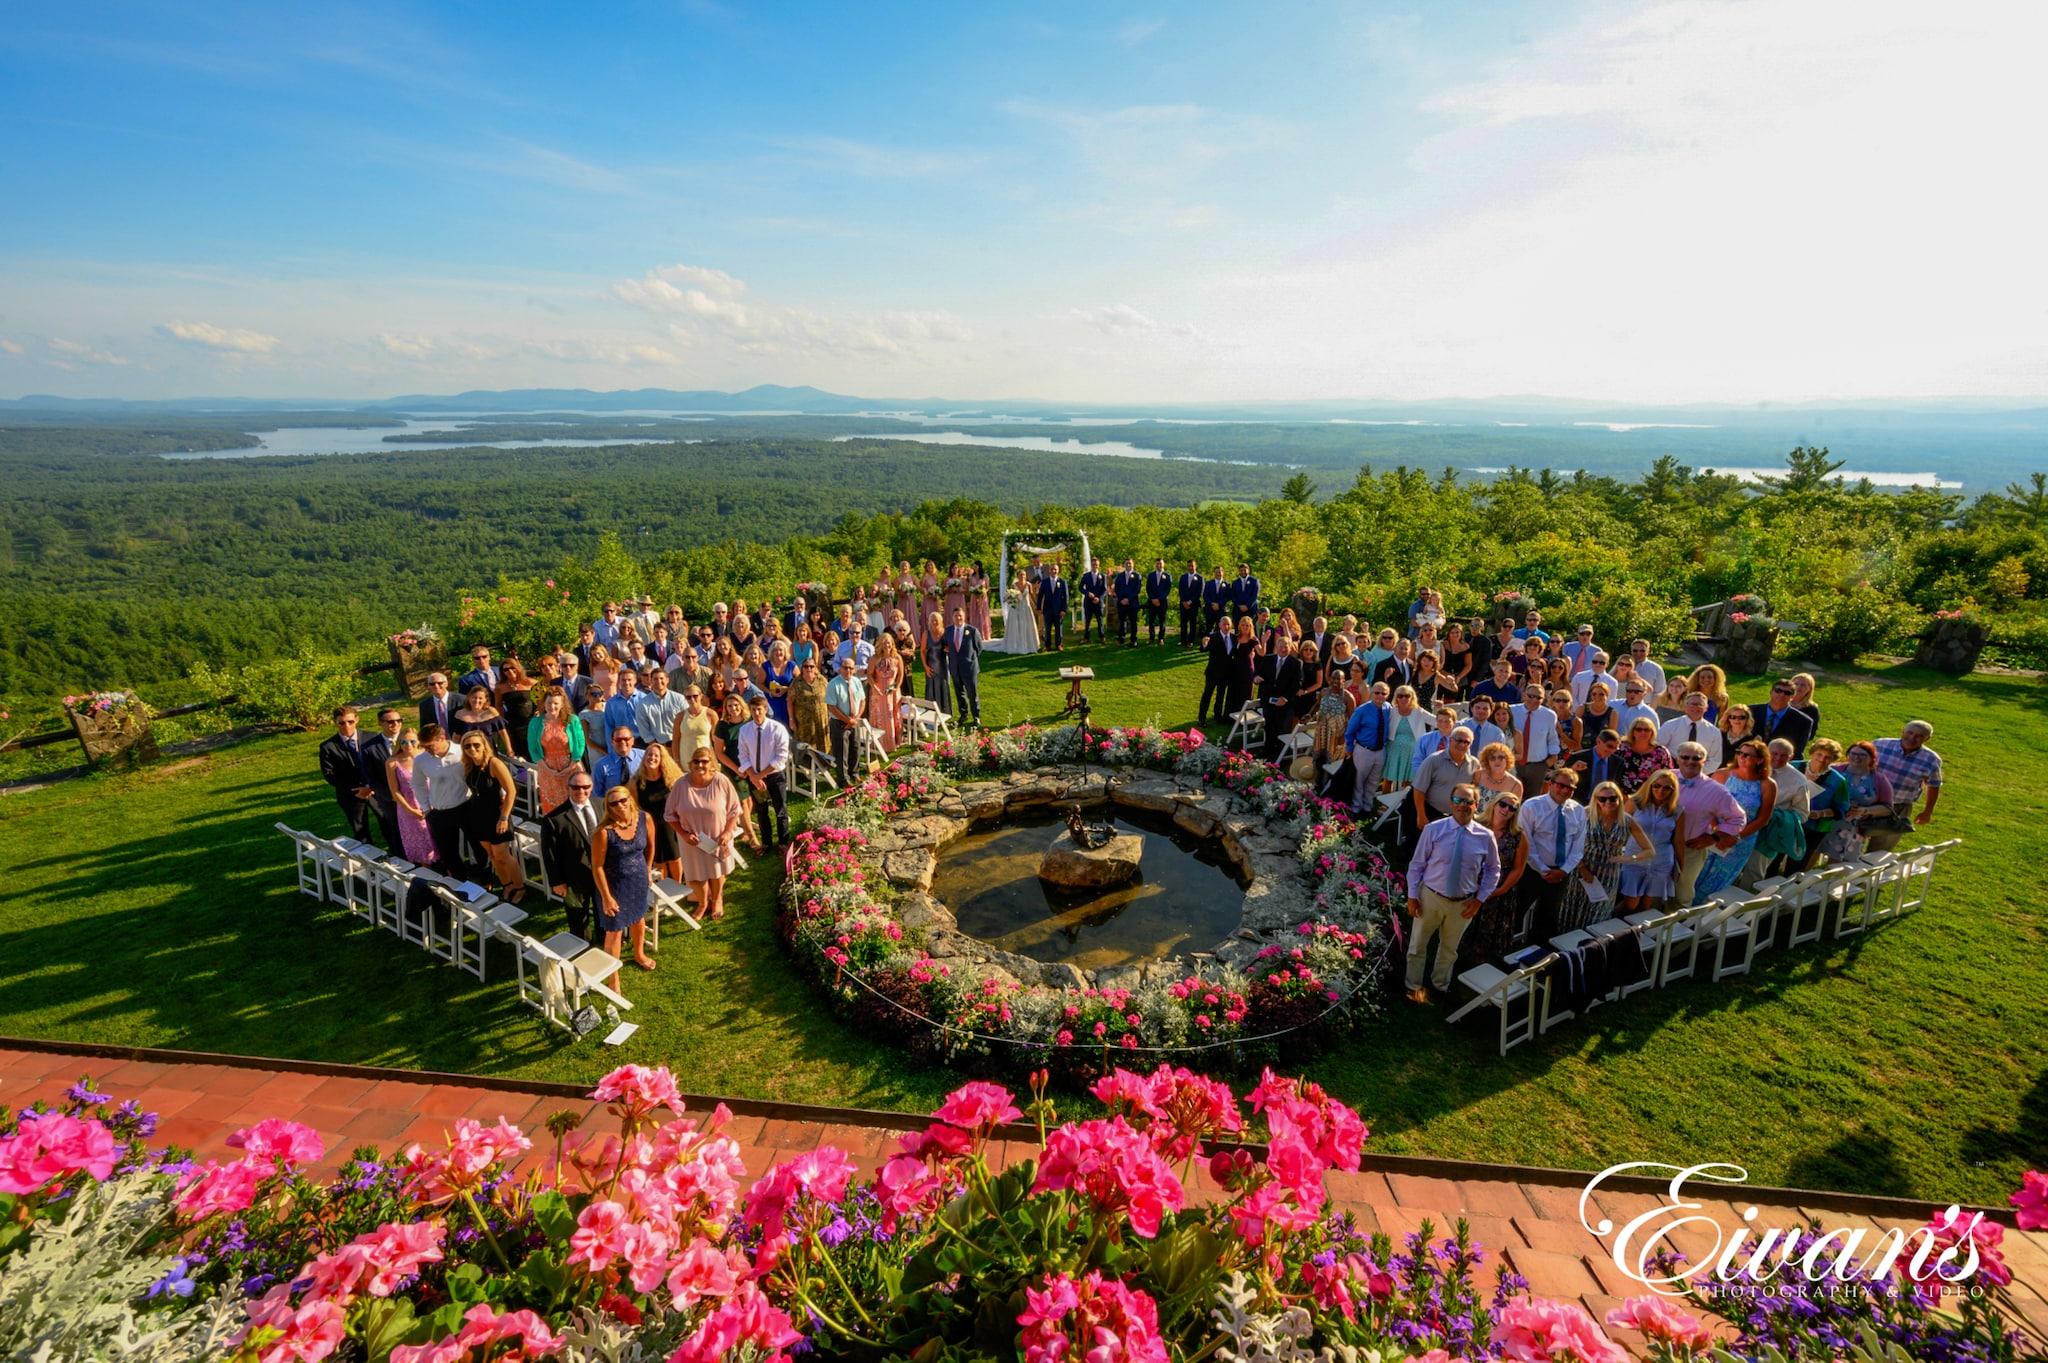 image of the entire wedding ceremony